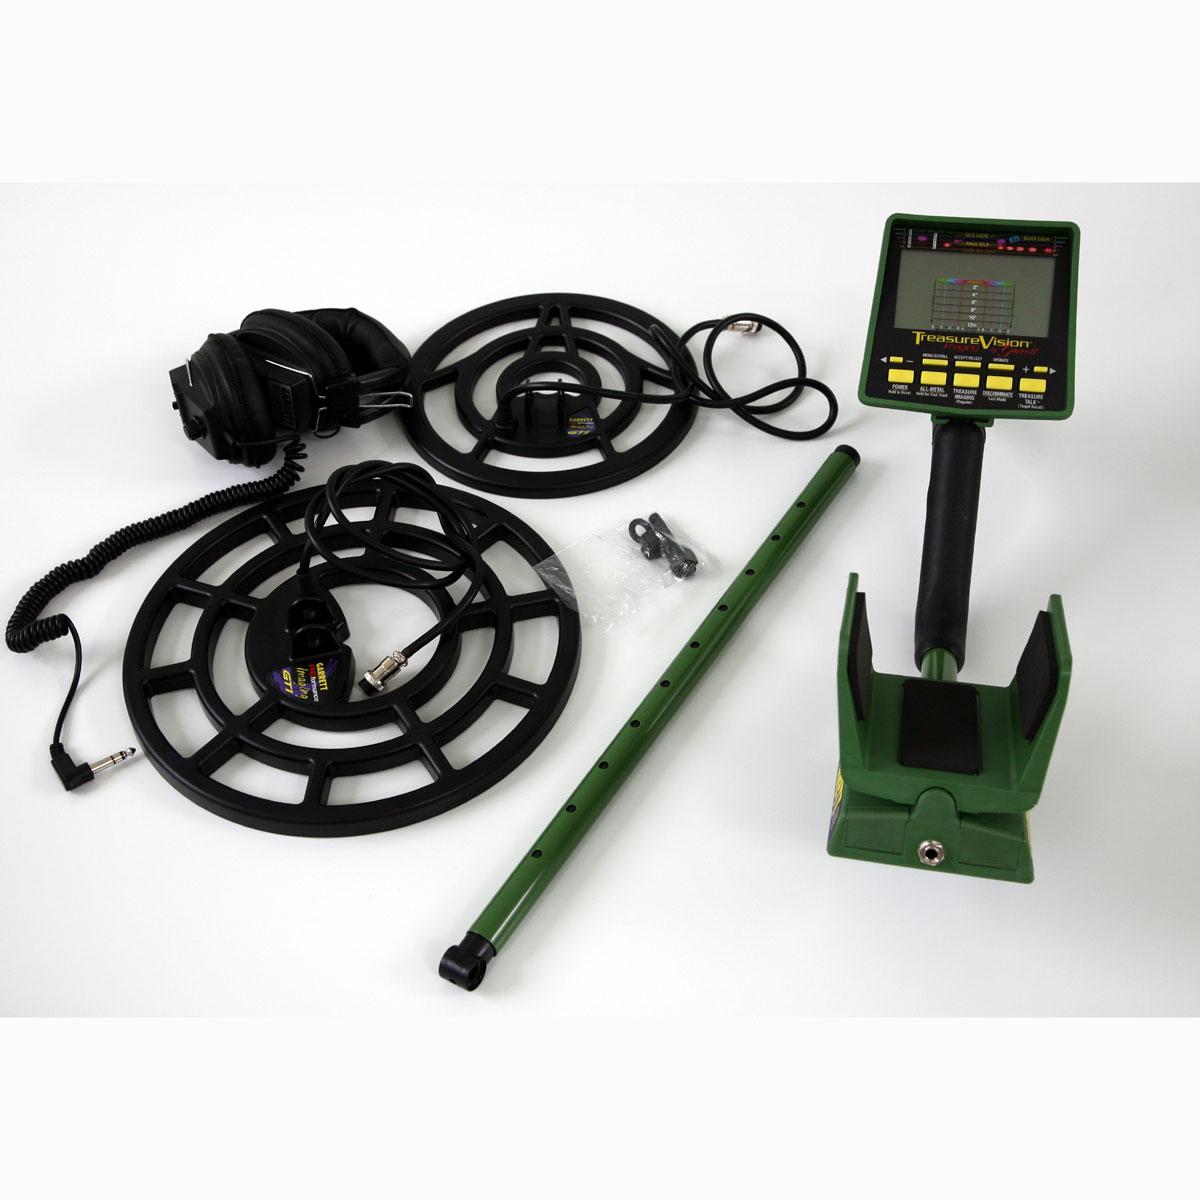 Металлоискатель garrett gti 2500 pro.